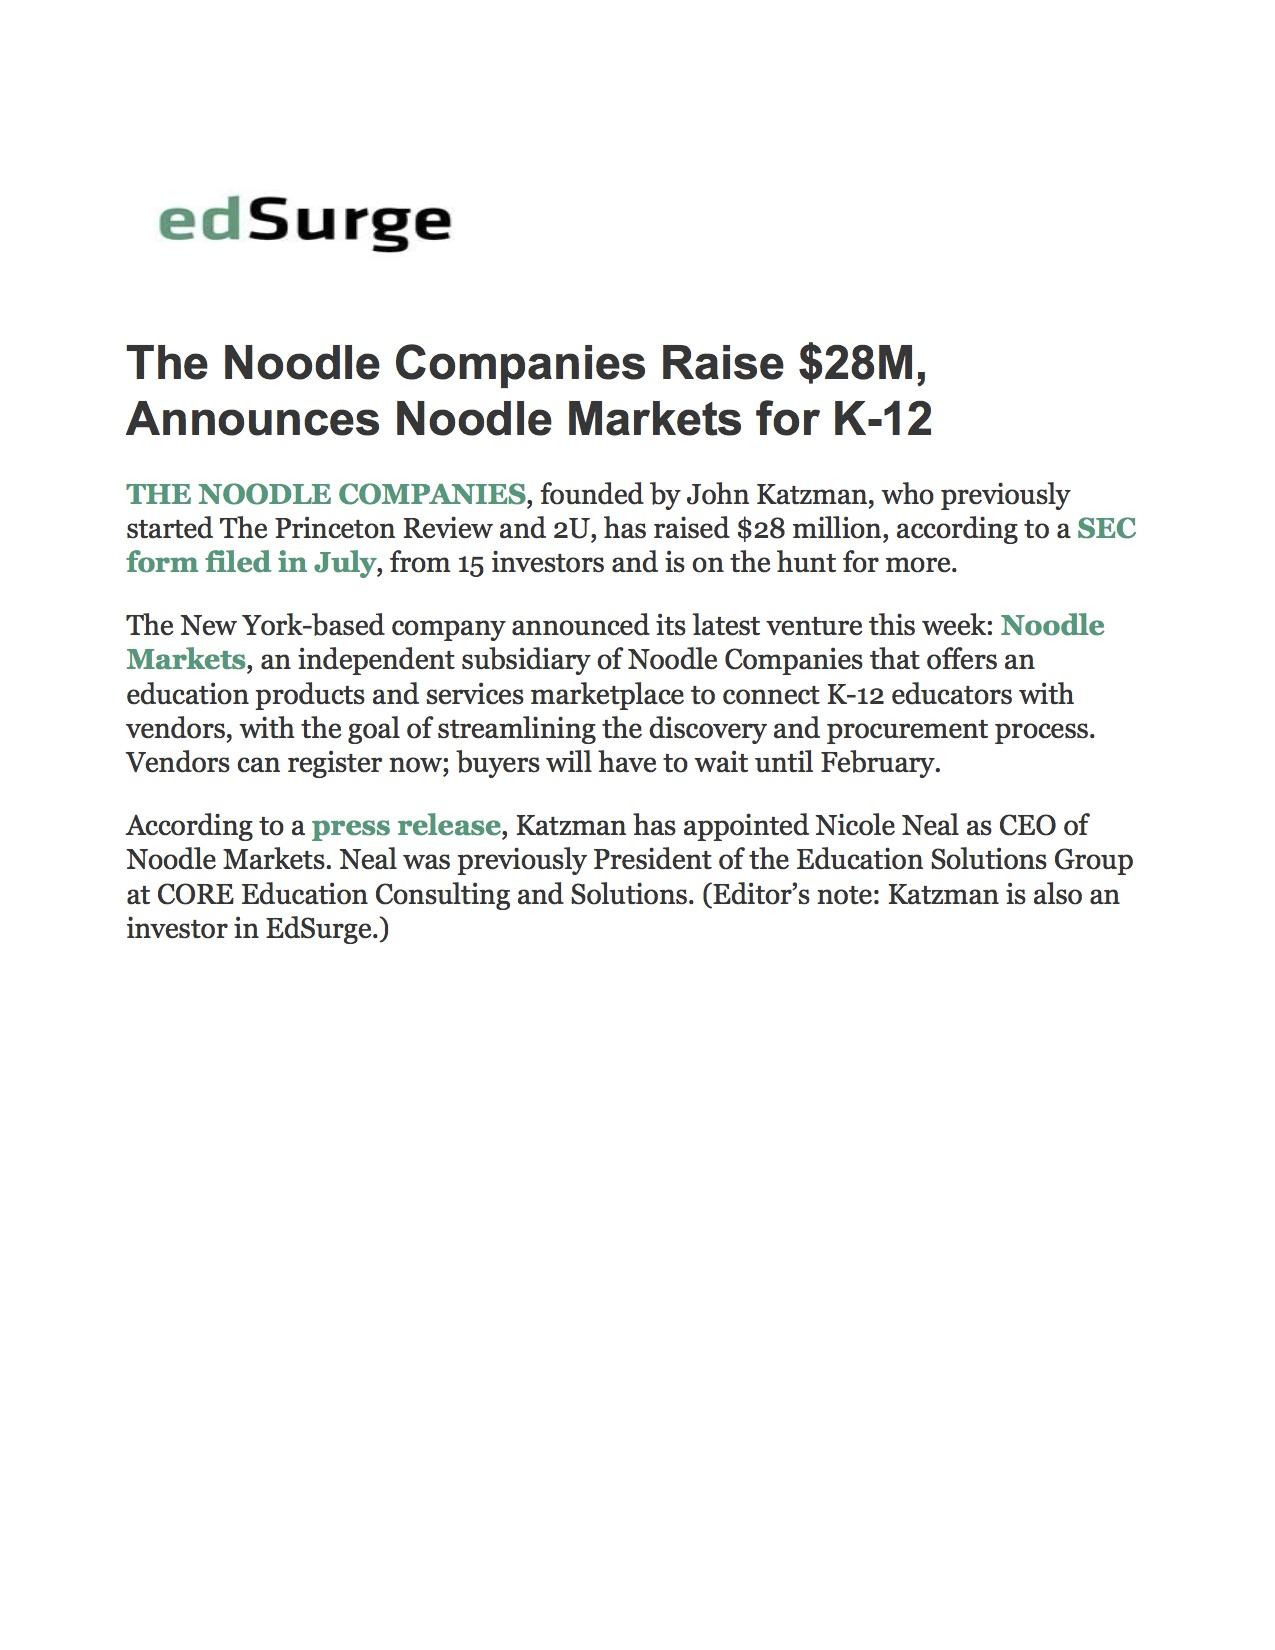 Funding: Noodle Markets, Ed Surge